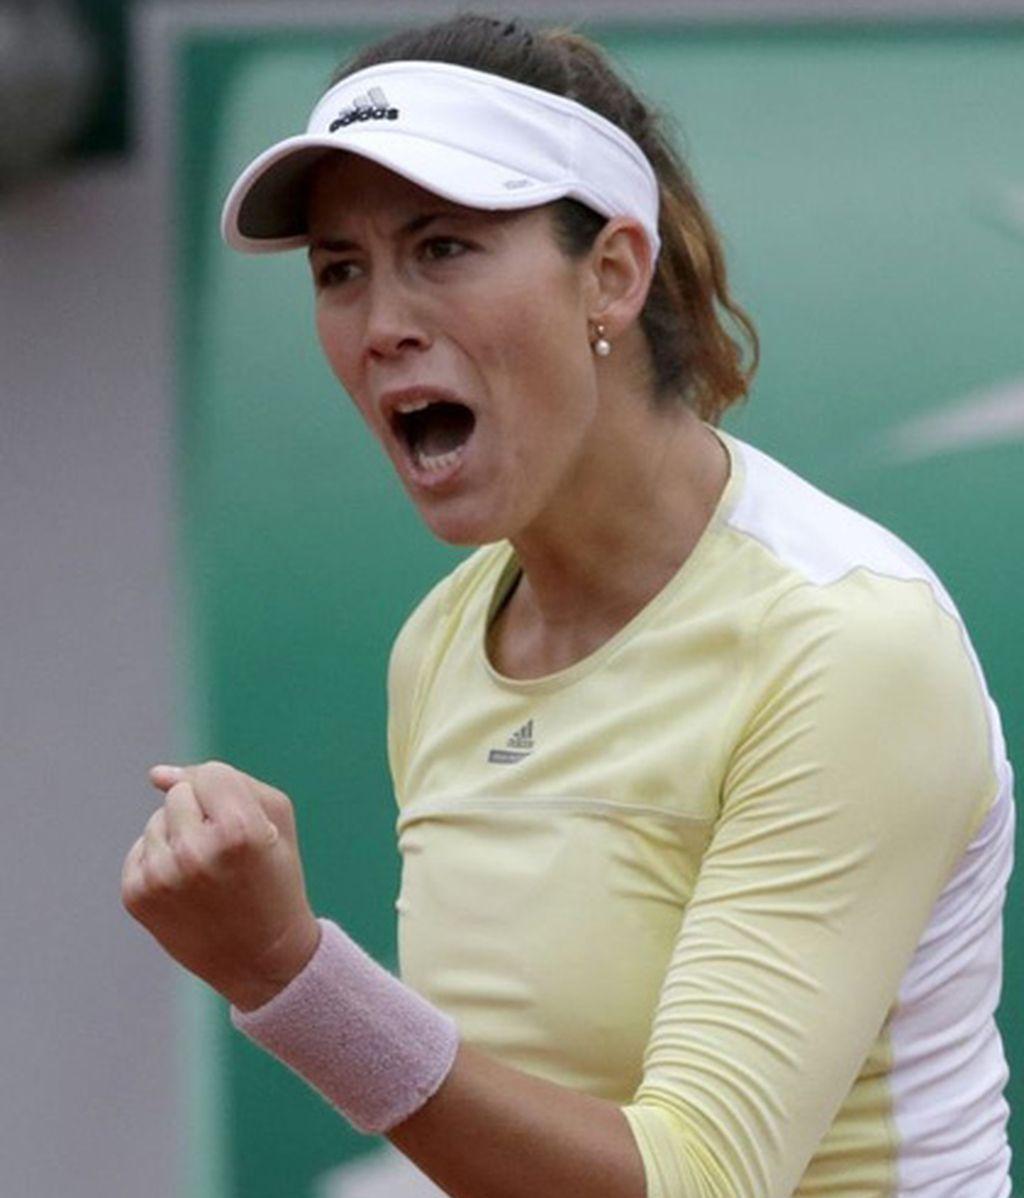 Garbiñe Muguruza pasa a la final de Roland Garros